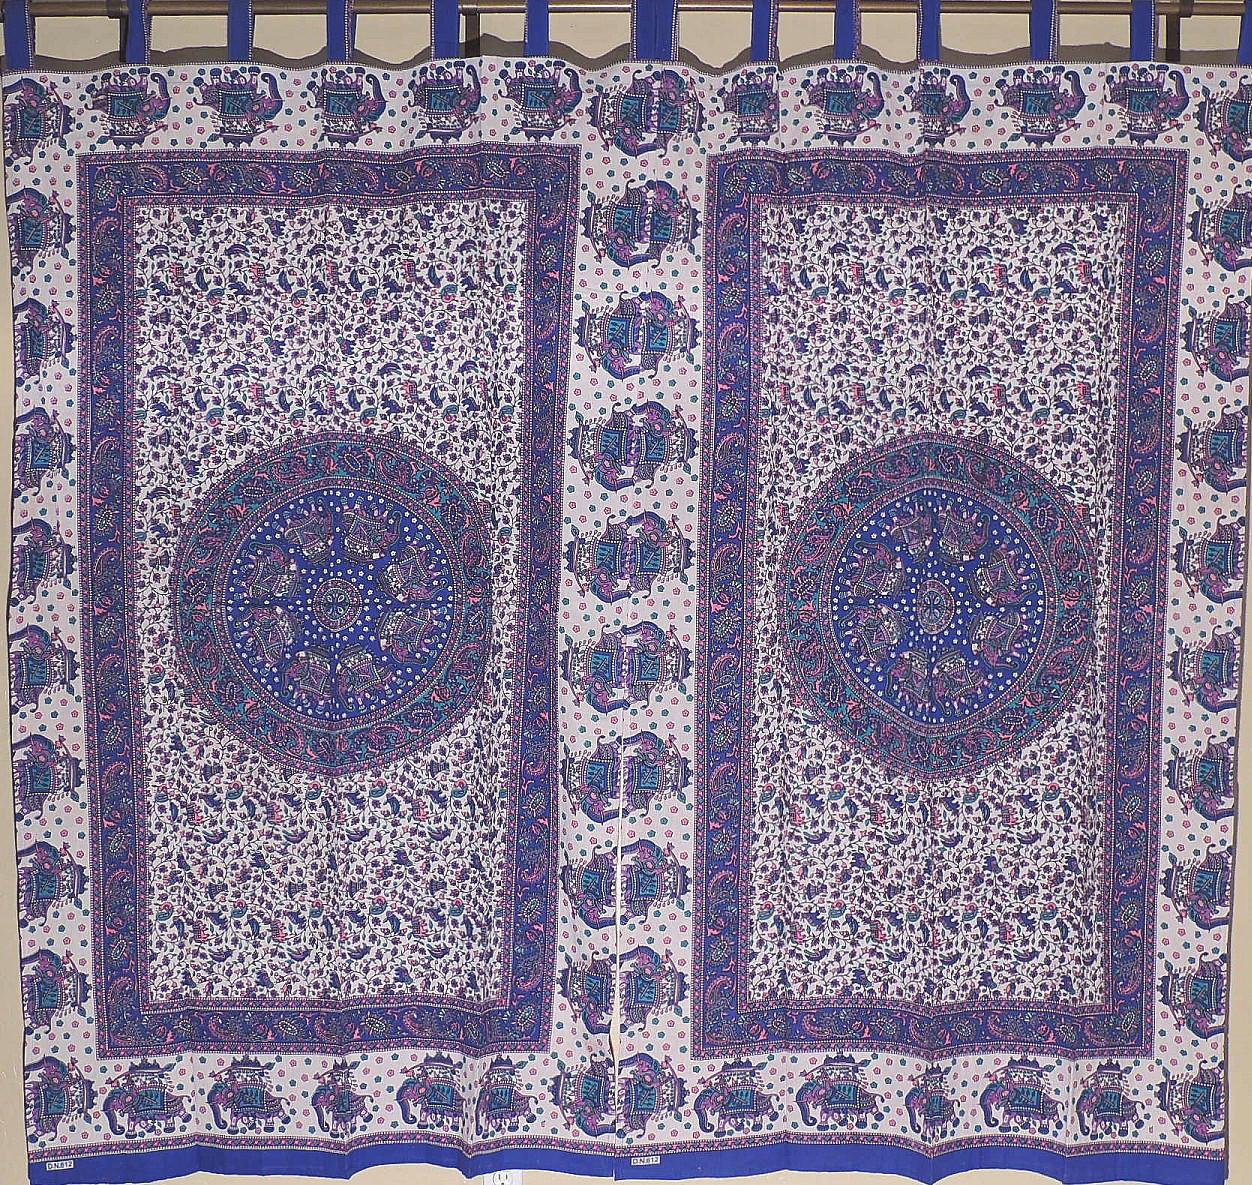 Blue Mandala Curtains With Elephants 2 Block Print Cotton Fabric Window Panels 78